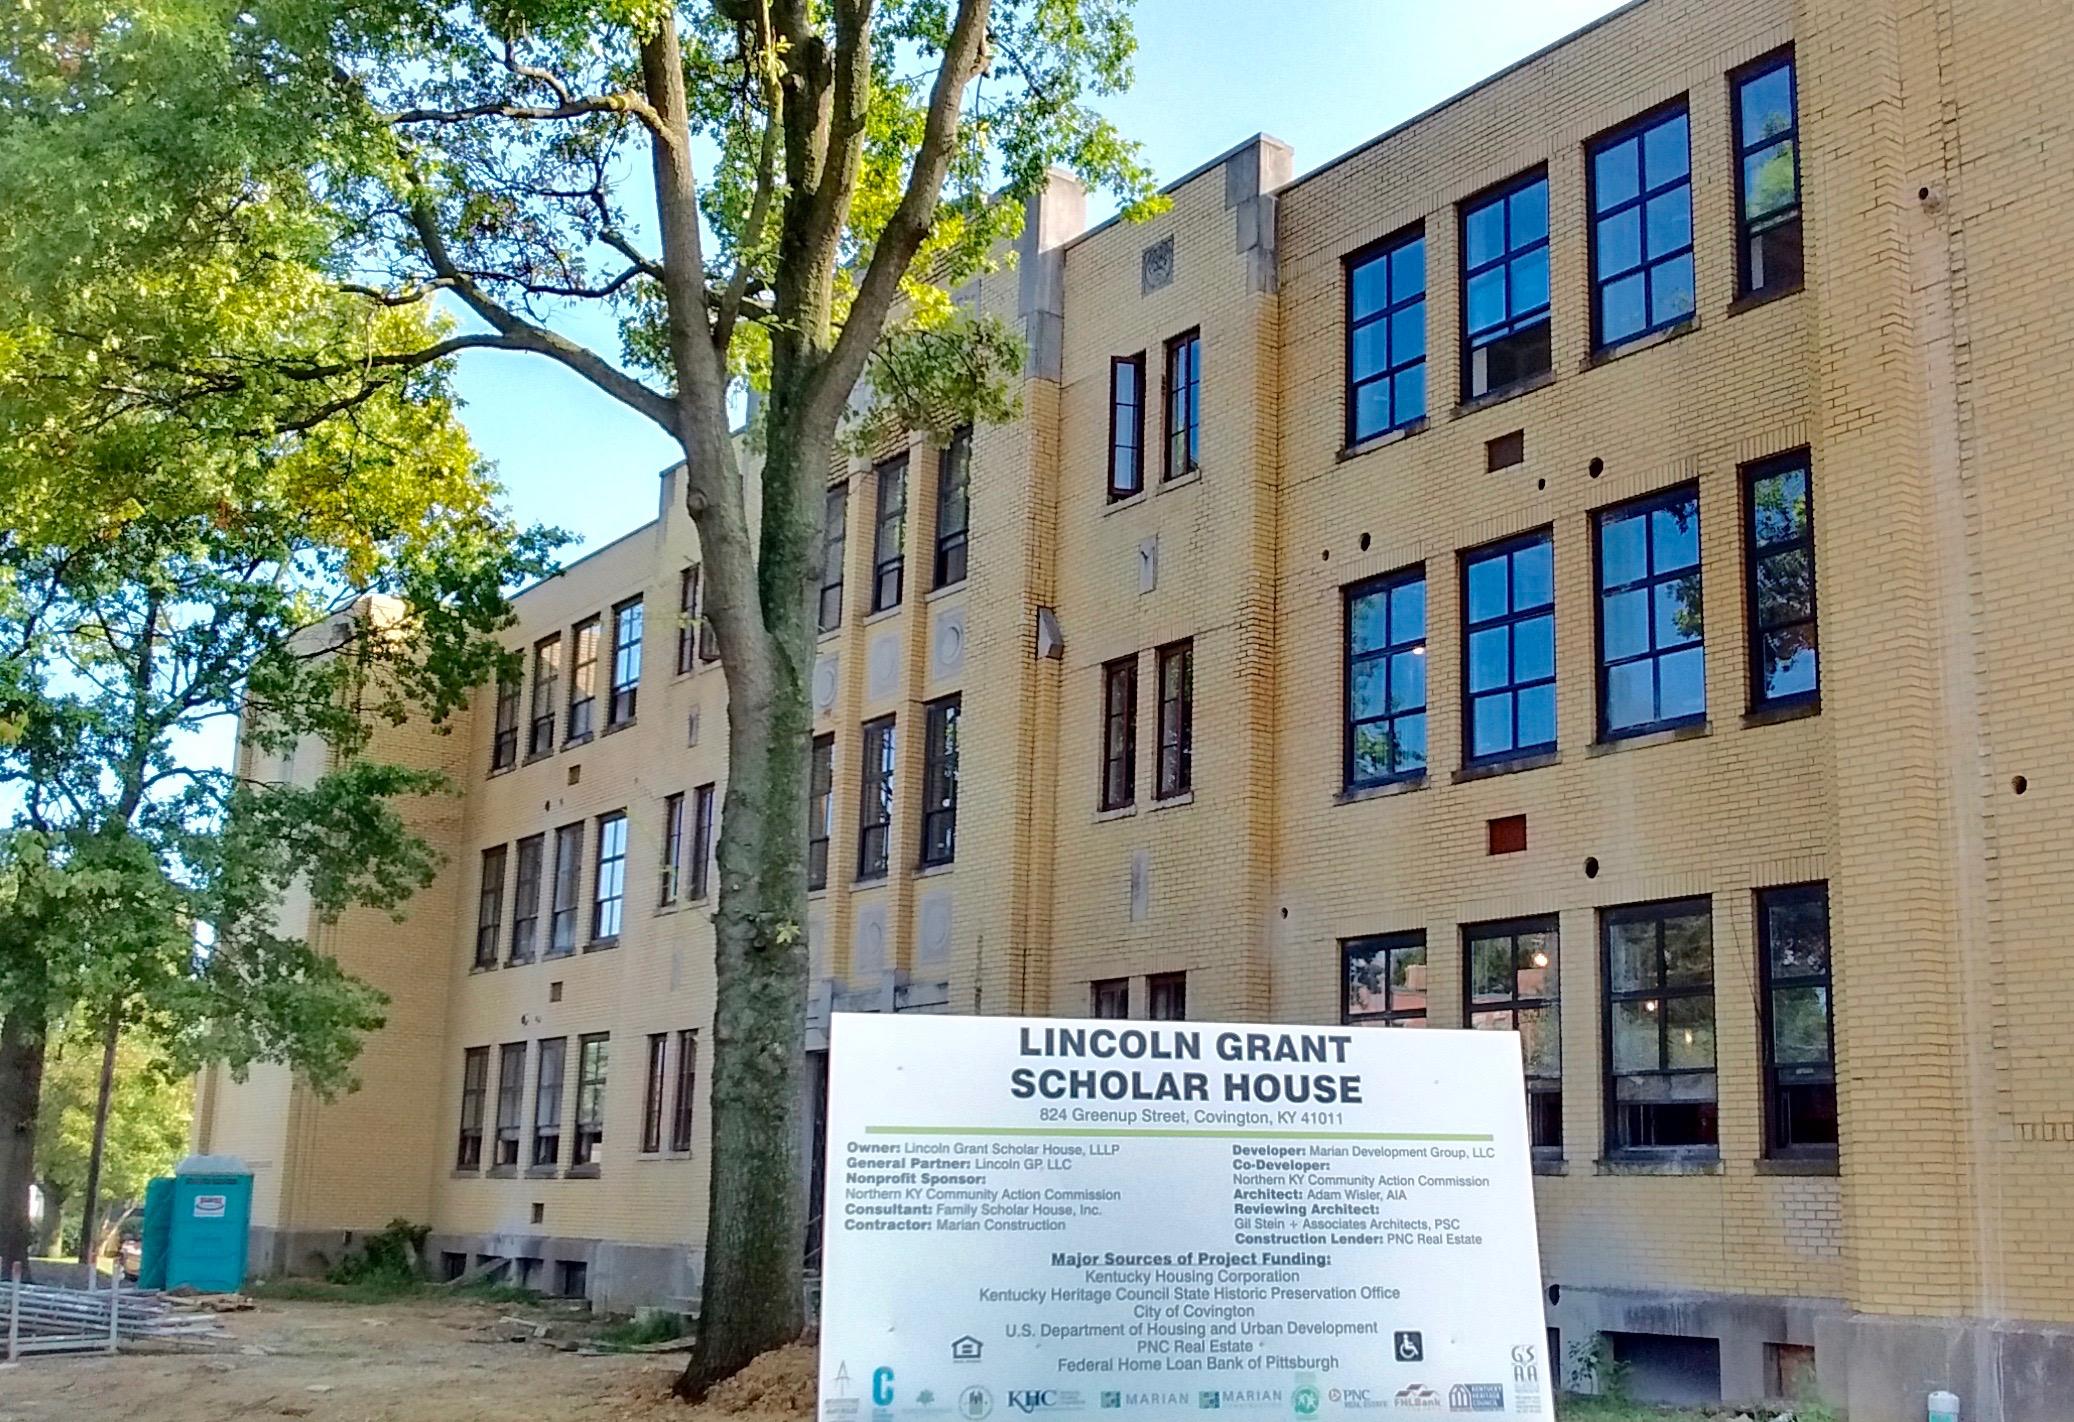 Lincoln Grant Scholar House